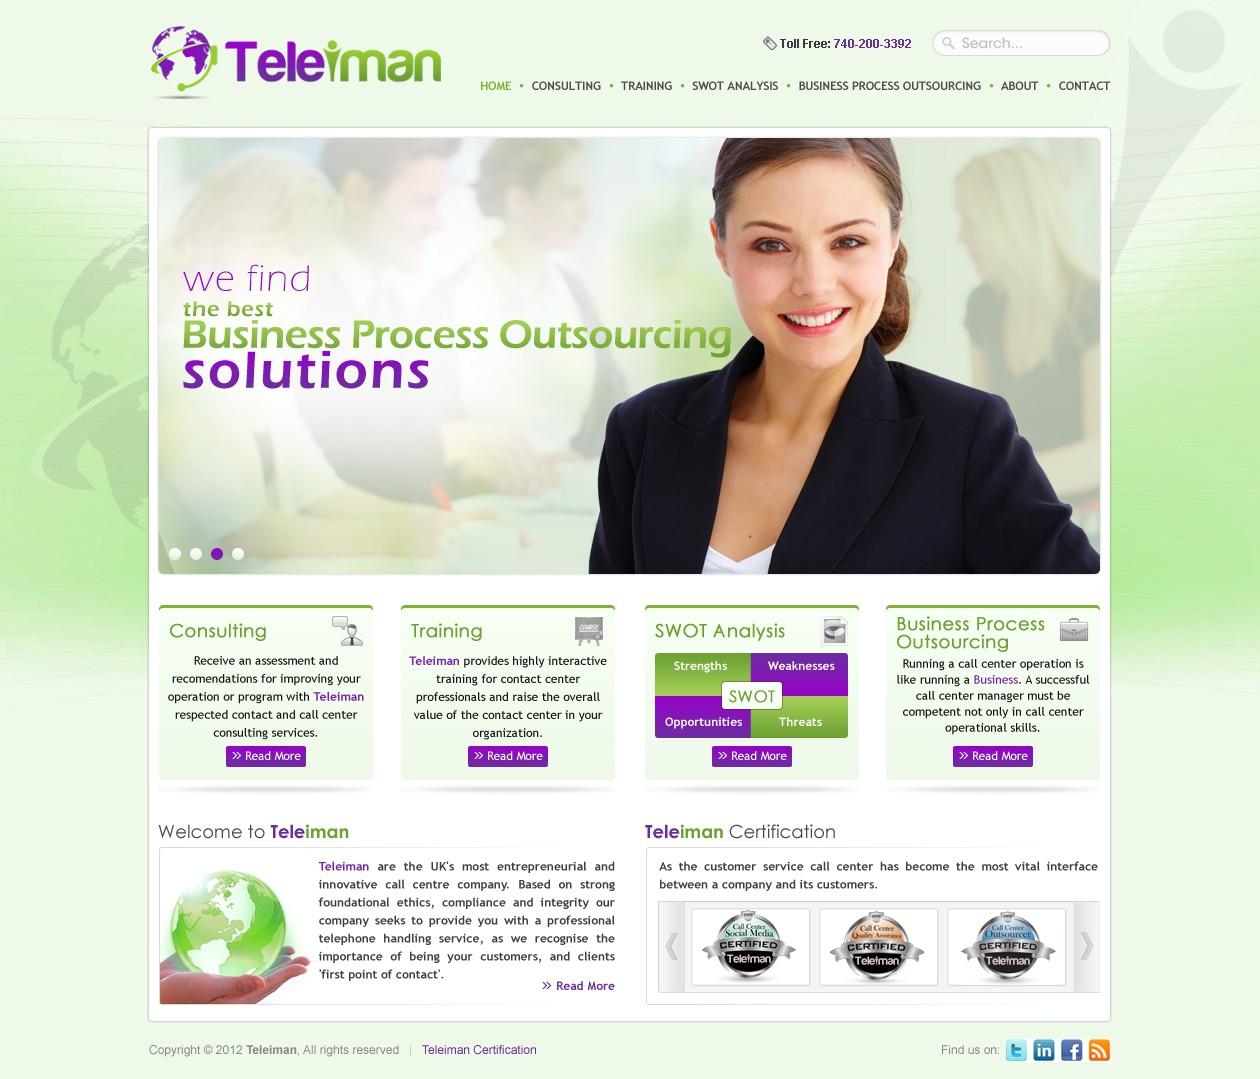 Create the next website design for teleiman